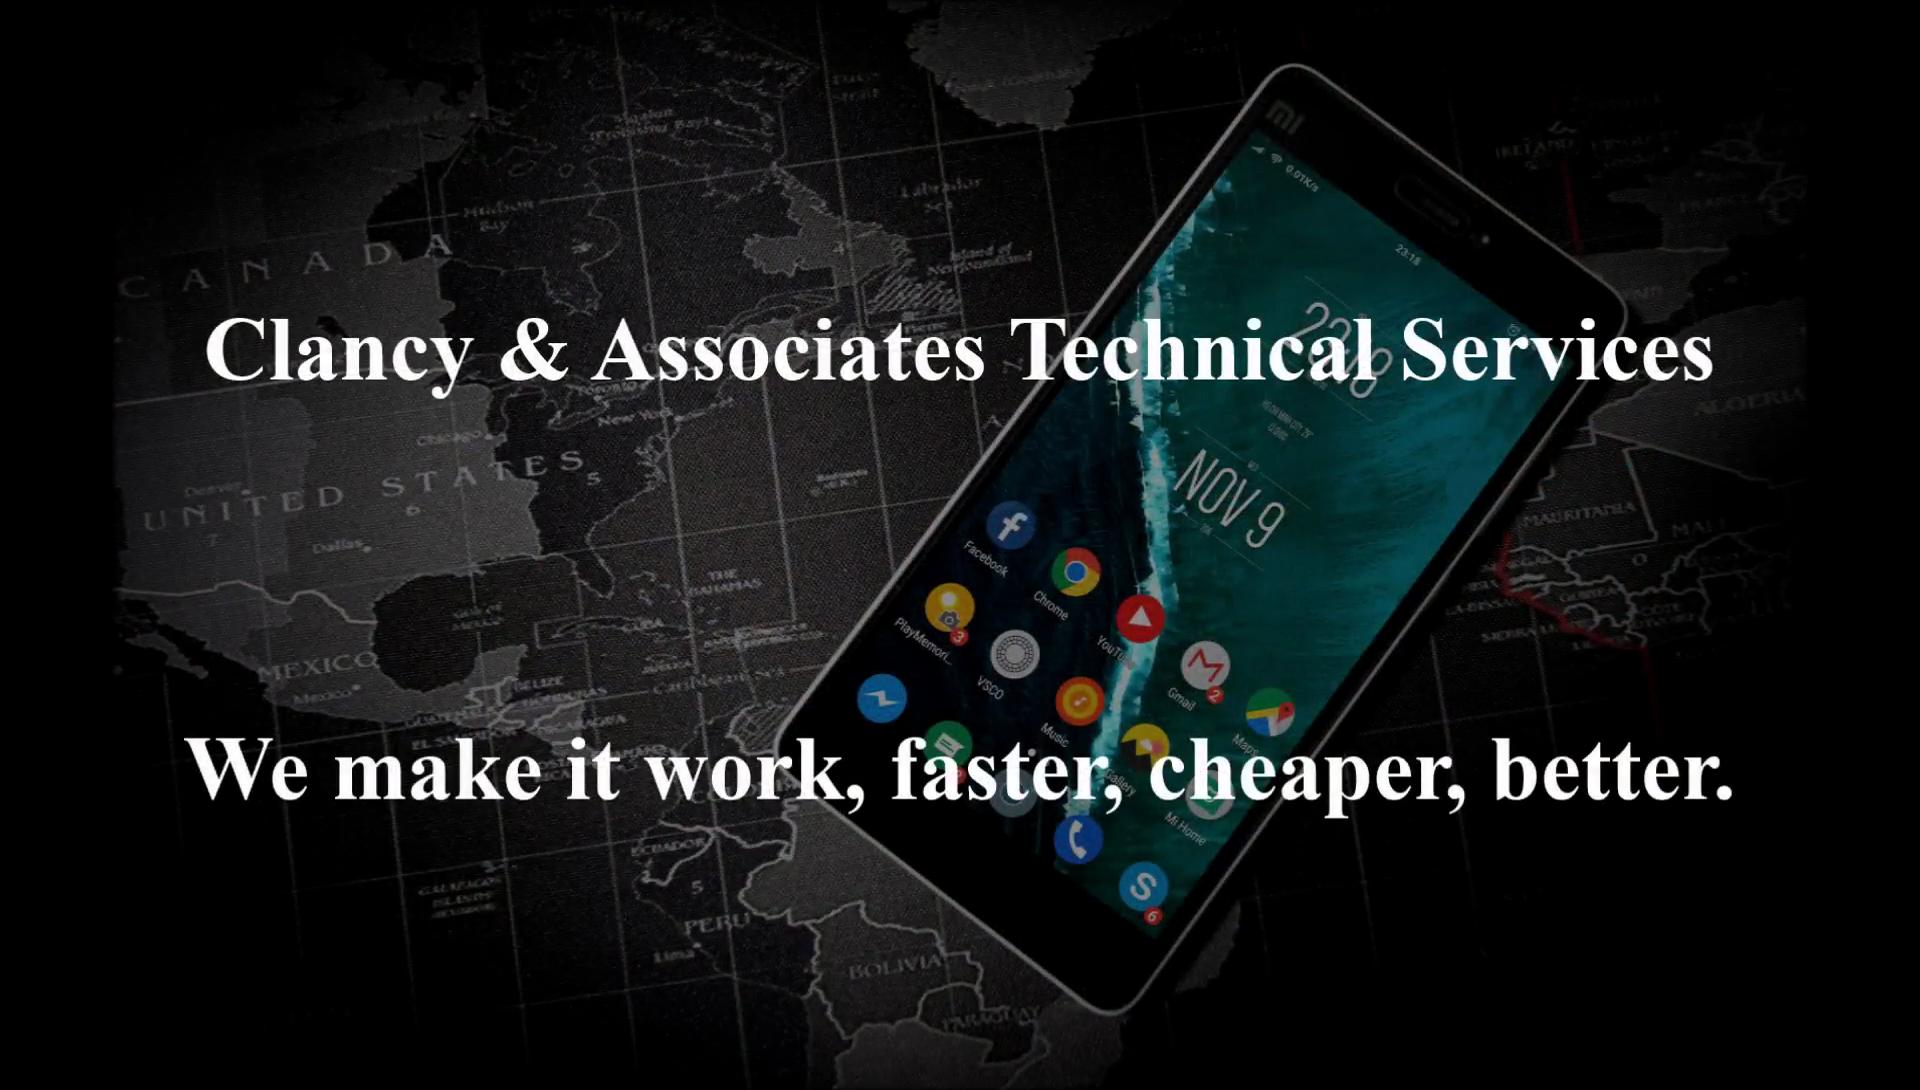 Clancy & Associates Technical Services LLC